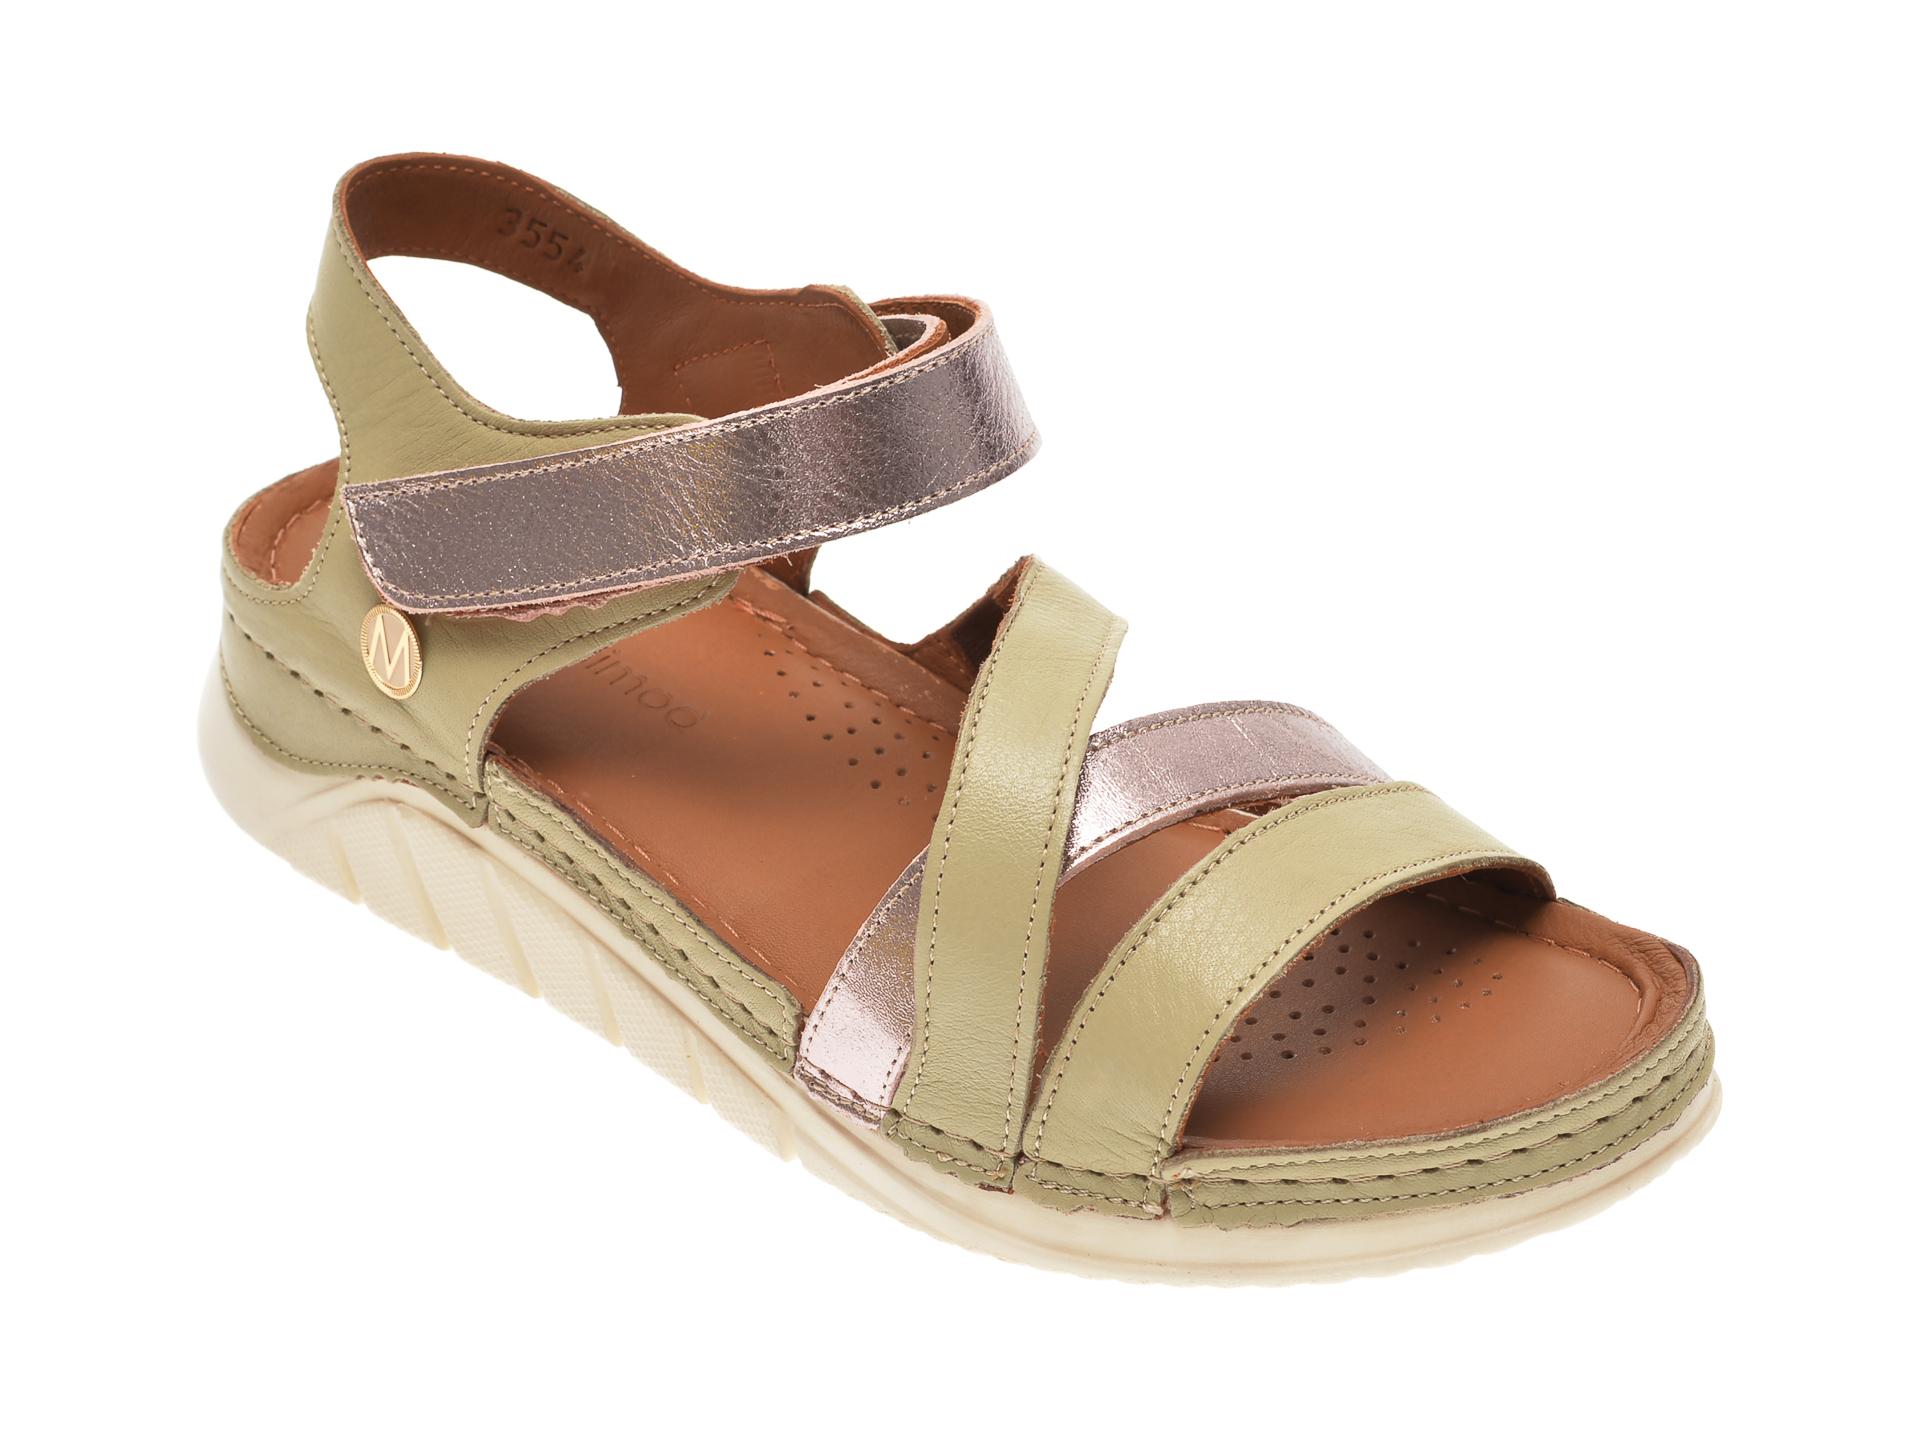 Sandale MESSIMODA verzi, 20Y3554, din piele naturala